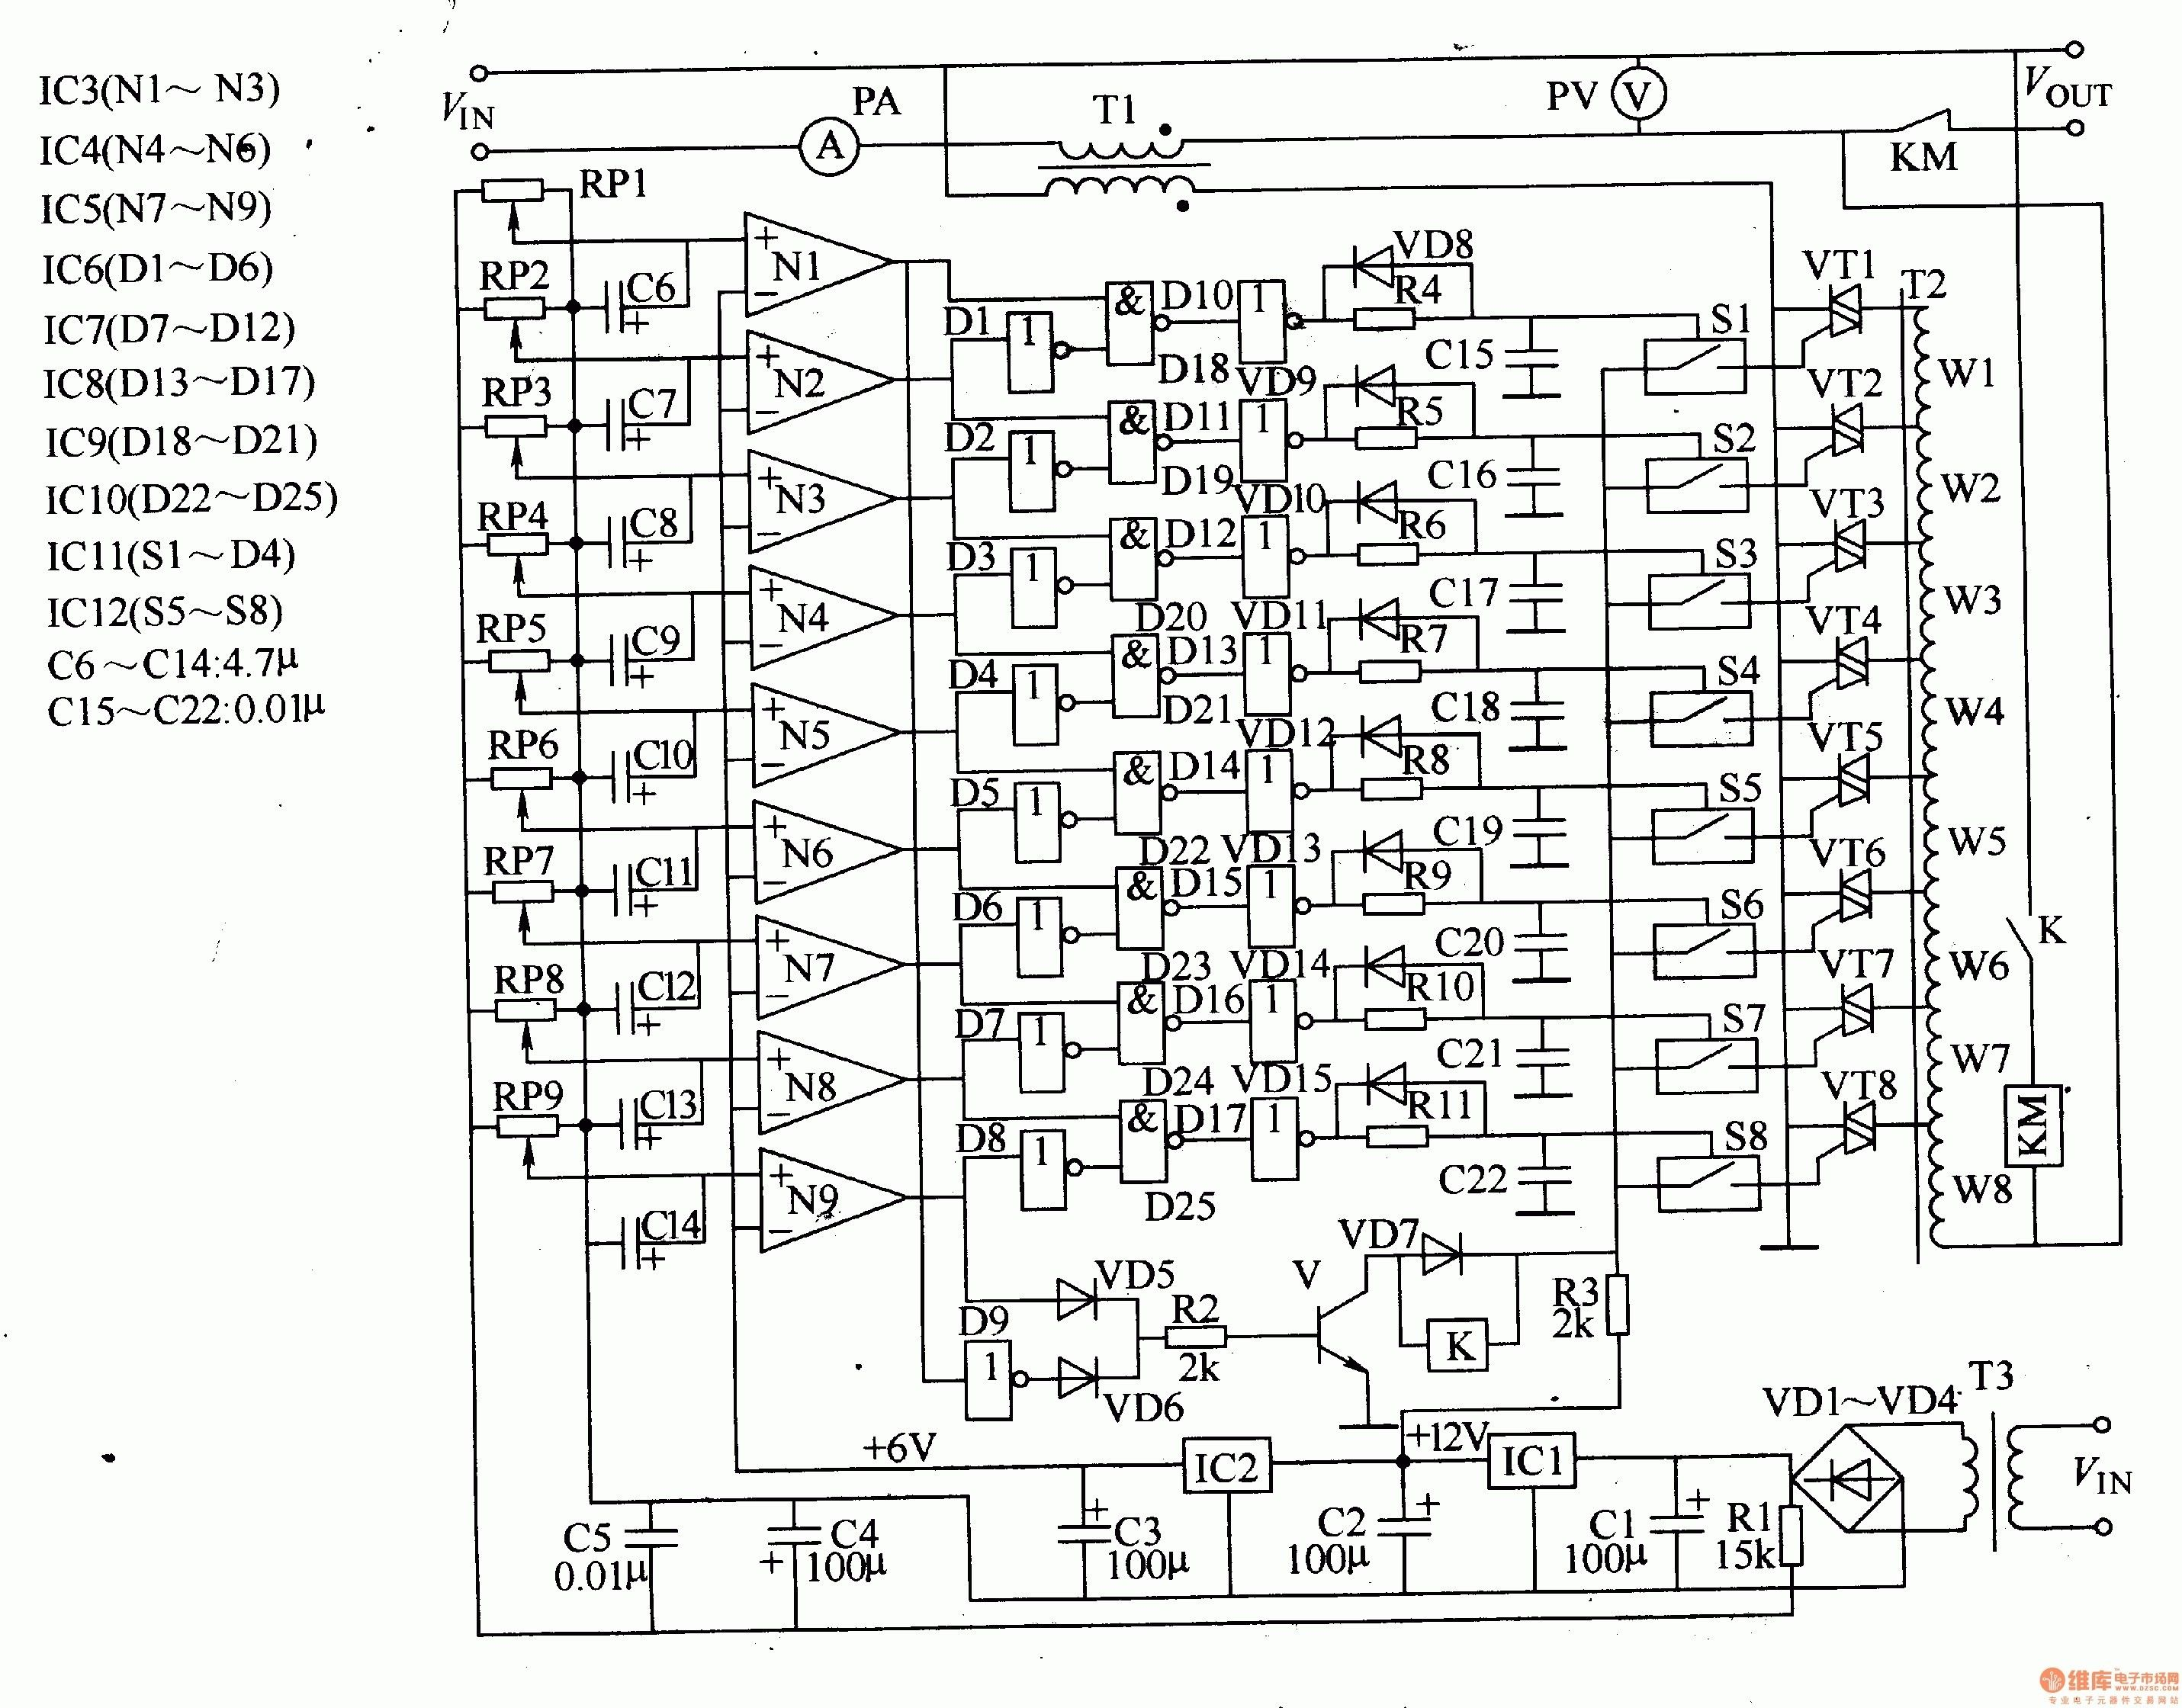 Inspirational Wiring Diagram Parrot Ck3100 #diagrams #